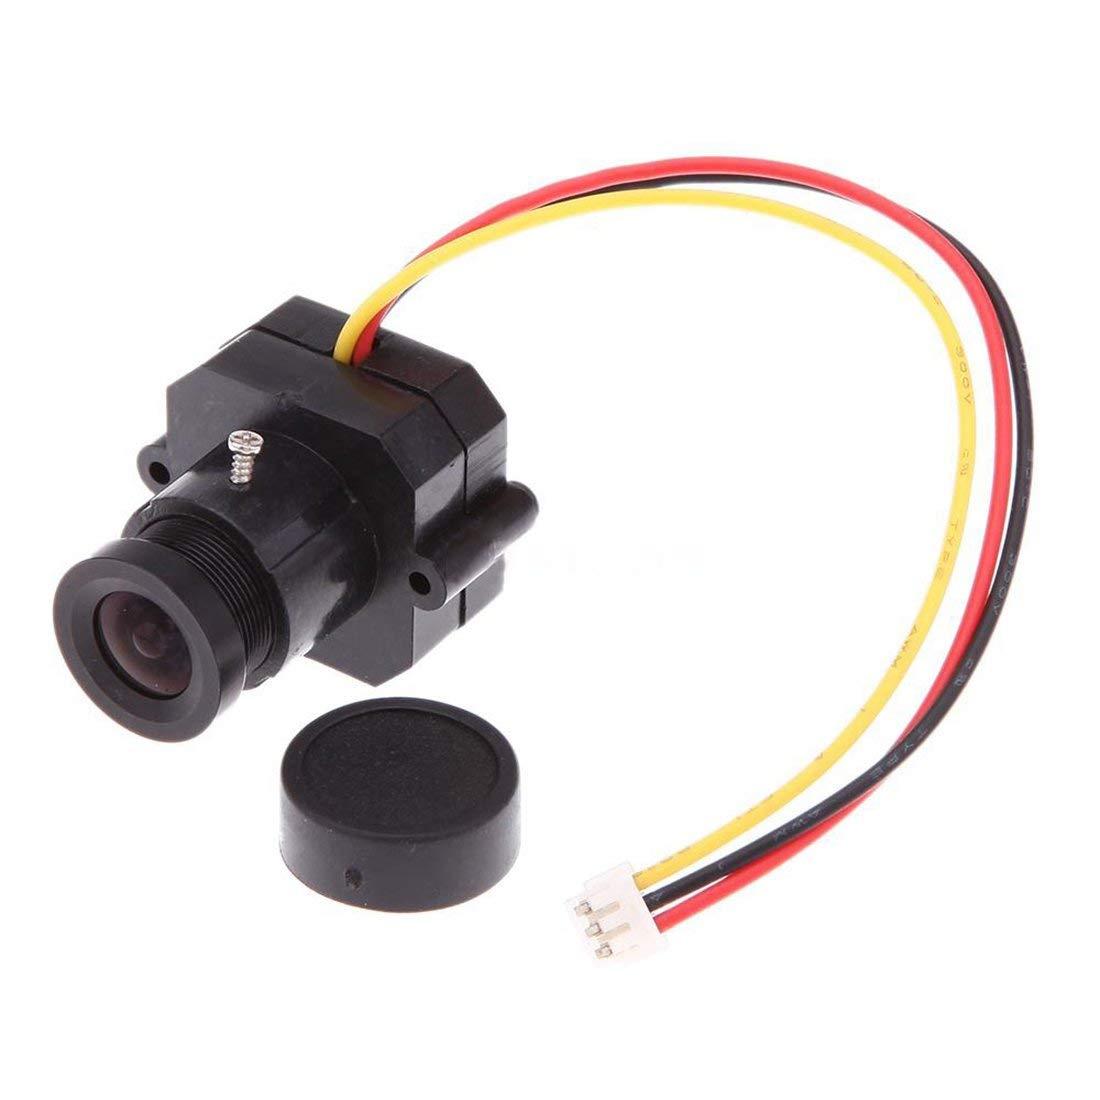 Mini Camera - SODIAL(R)High Permance FPV 1/3 inch HD Color CMOS 600TVL Mini Camera PAL System SM7I